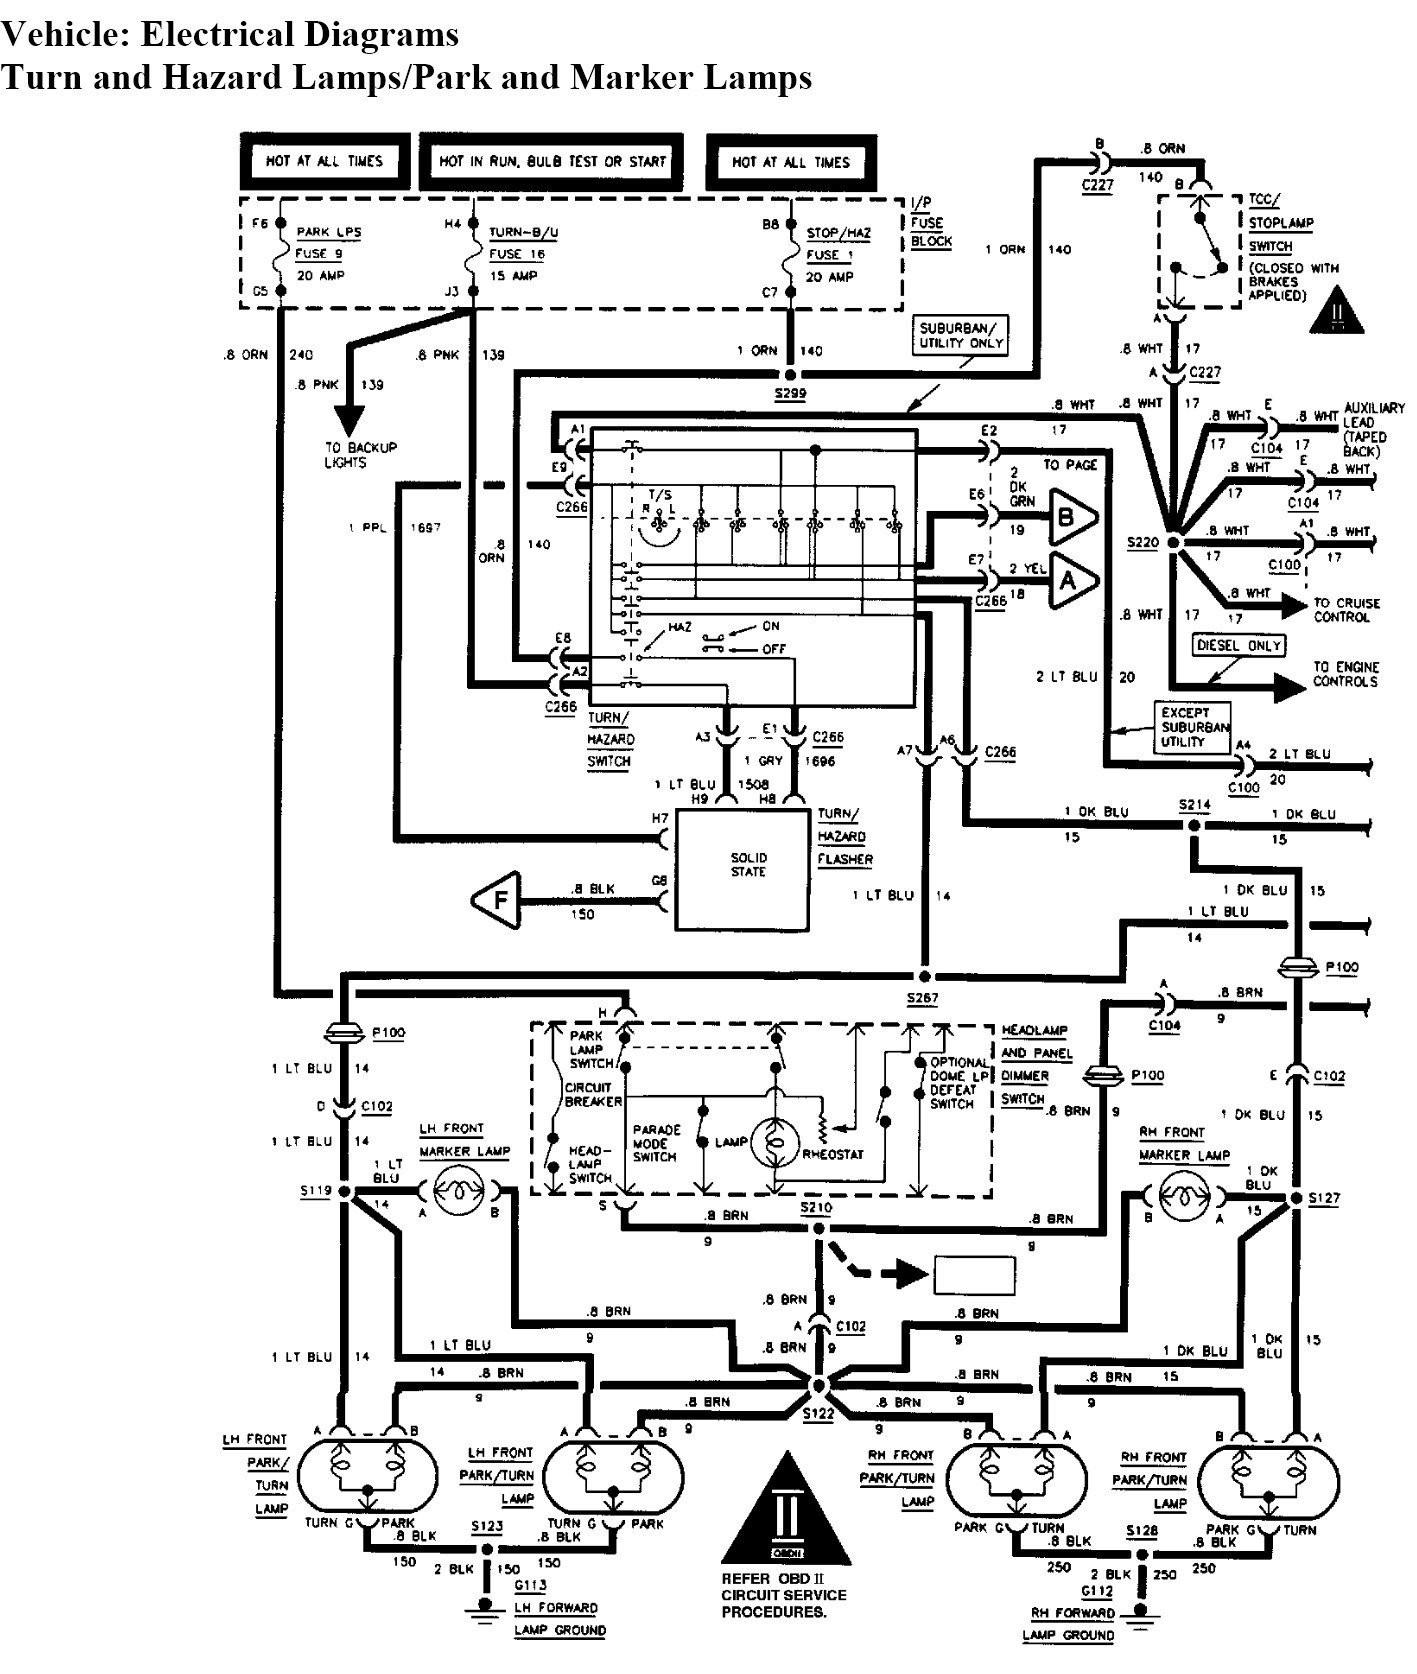 Brake Light Wiring Diagram 1994 Gmc Sierra Chevy Trailblazer Tail Light Diagram Wiring Diagram Rows Of Brake Light Wiring Diagram 1994 Gmc Sierra